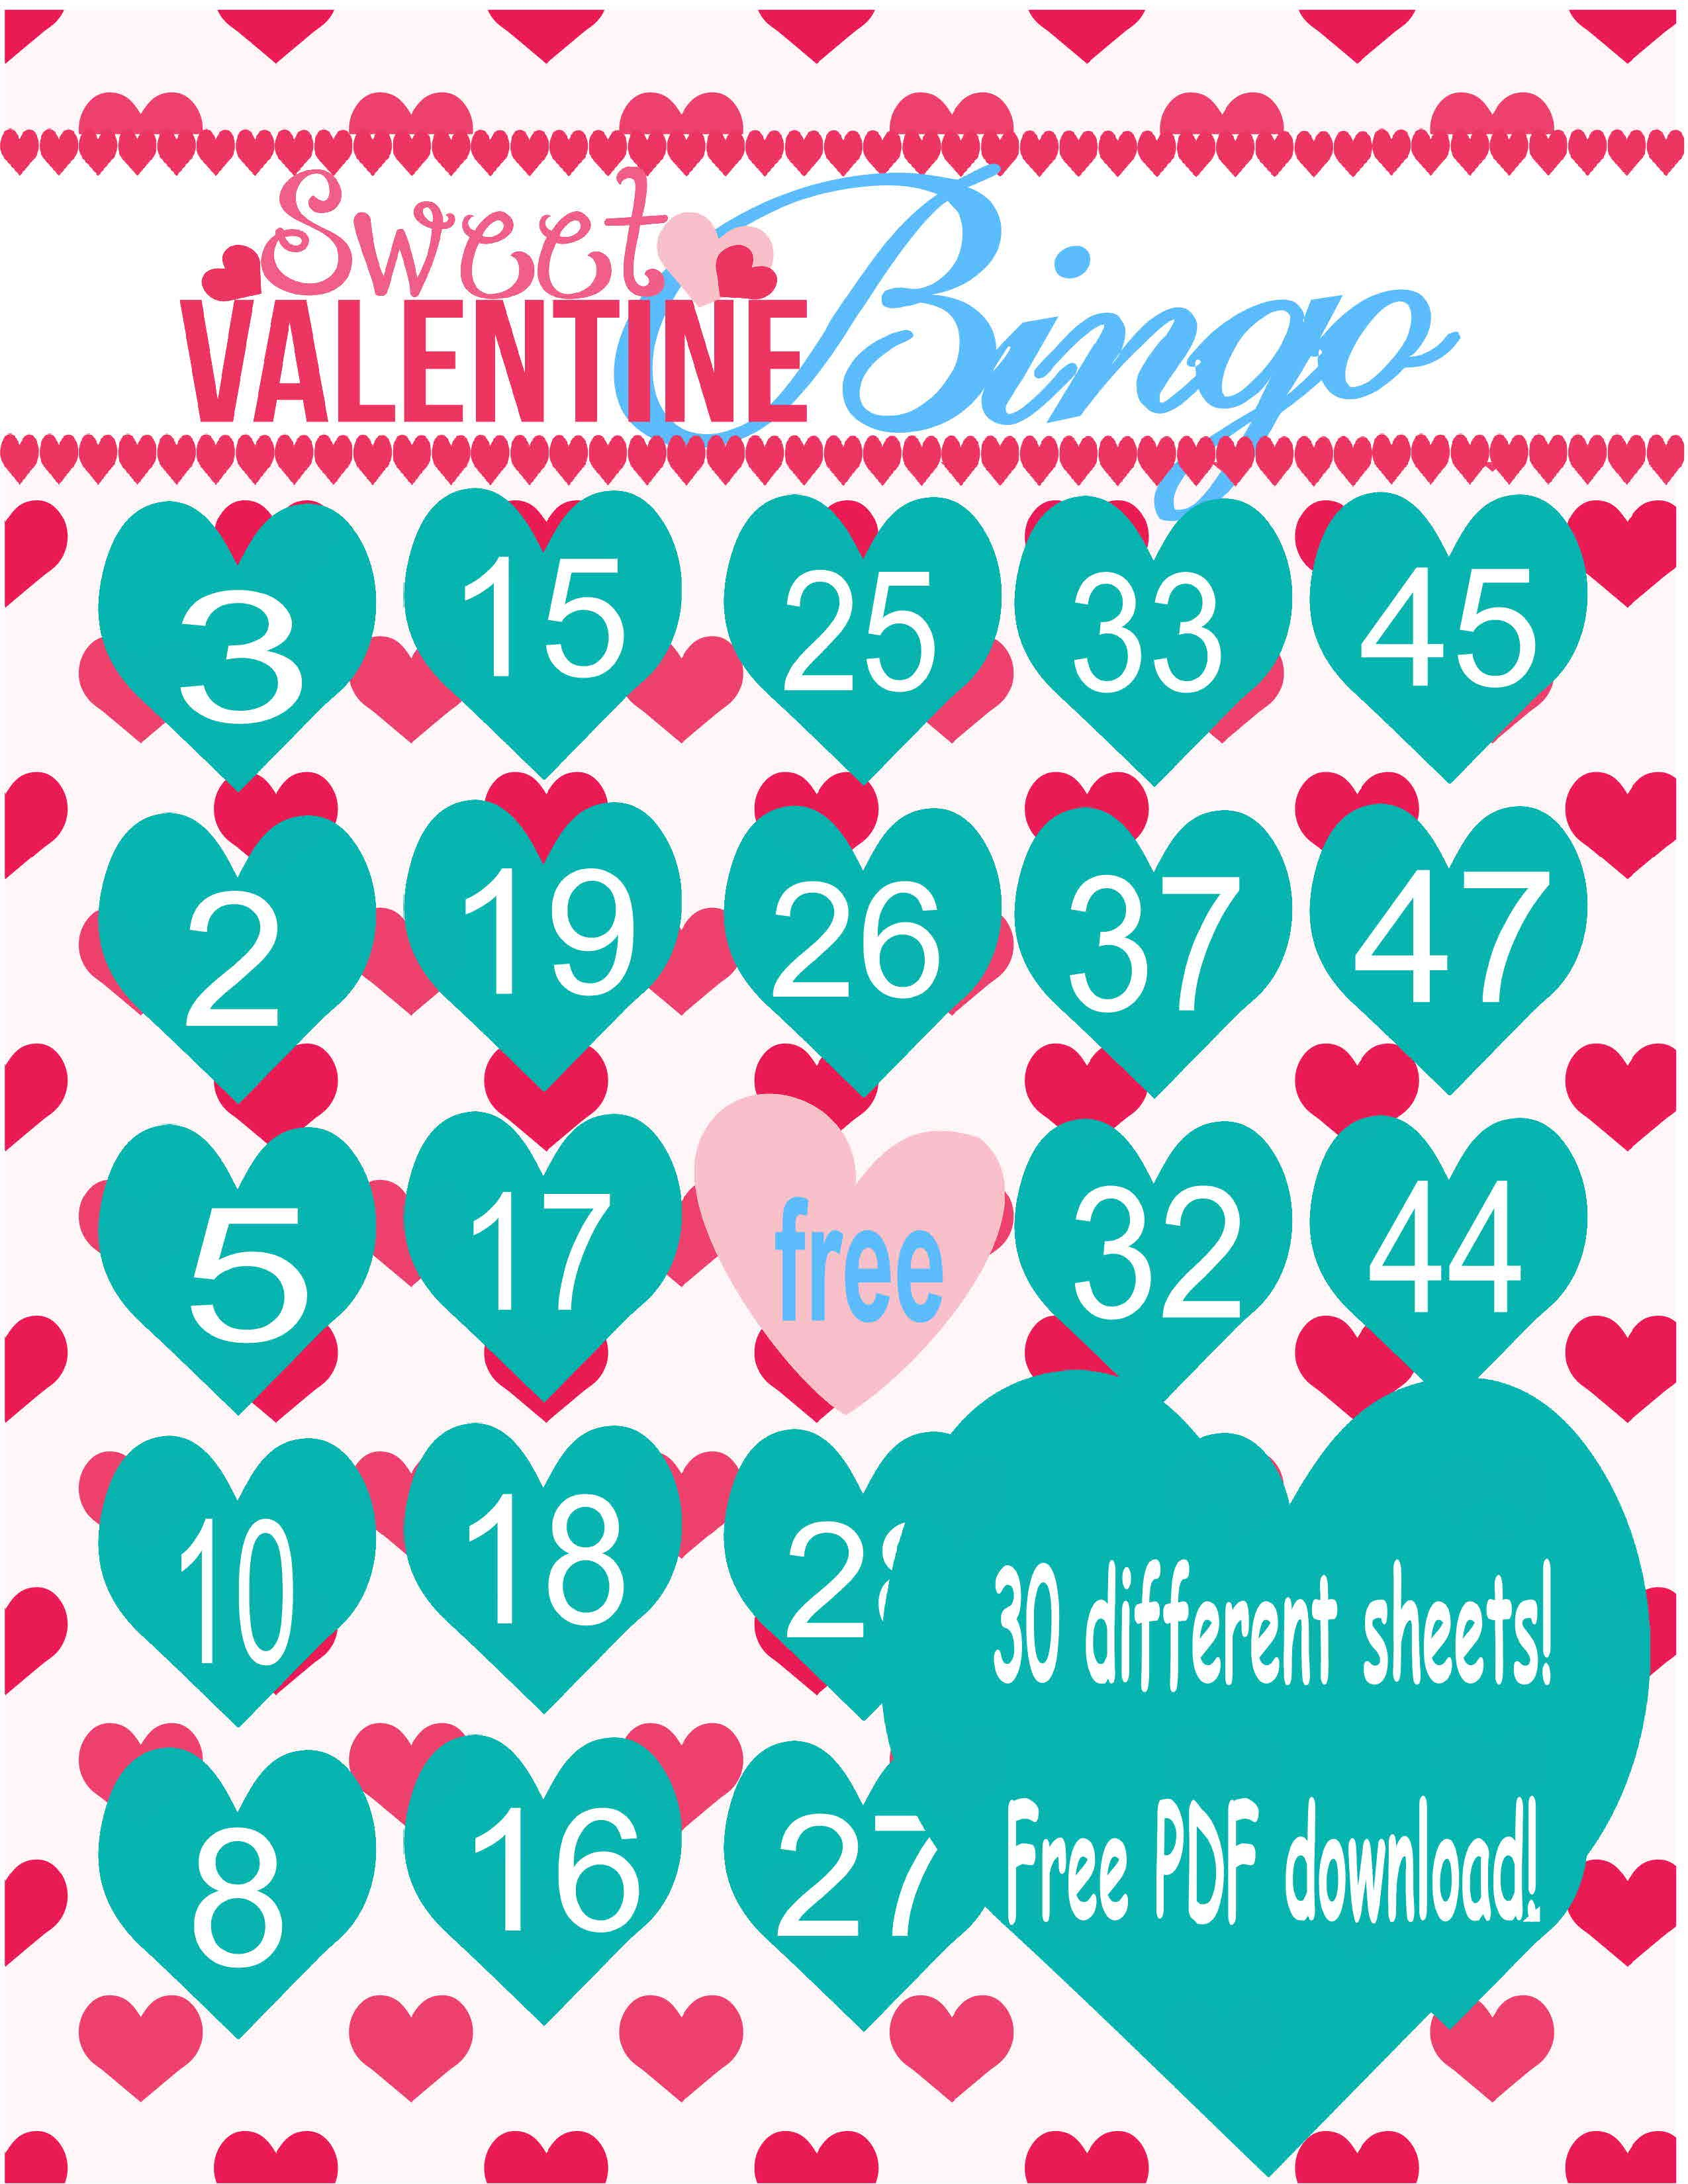 free pdf valentines day bingo game for 30 kids create a colorful life - Valentine Bingo Cards